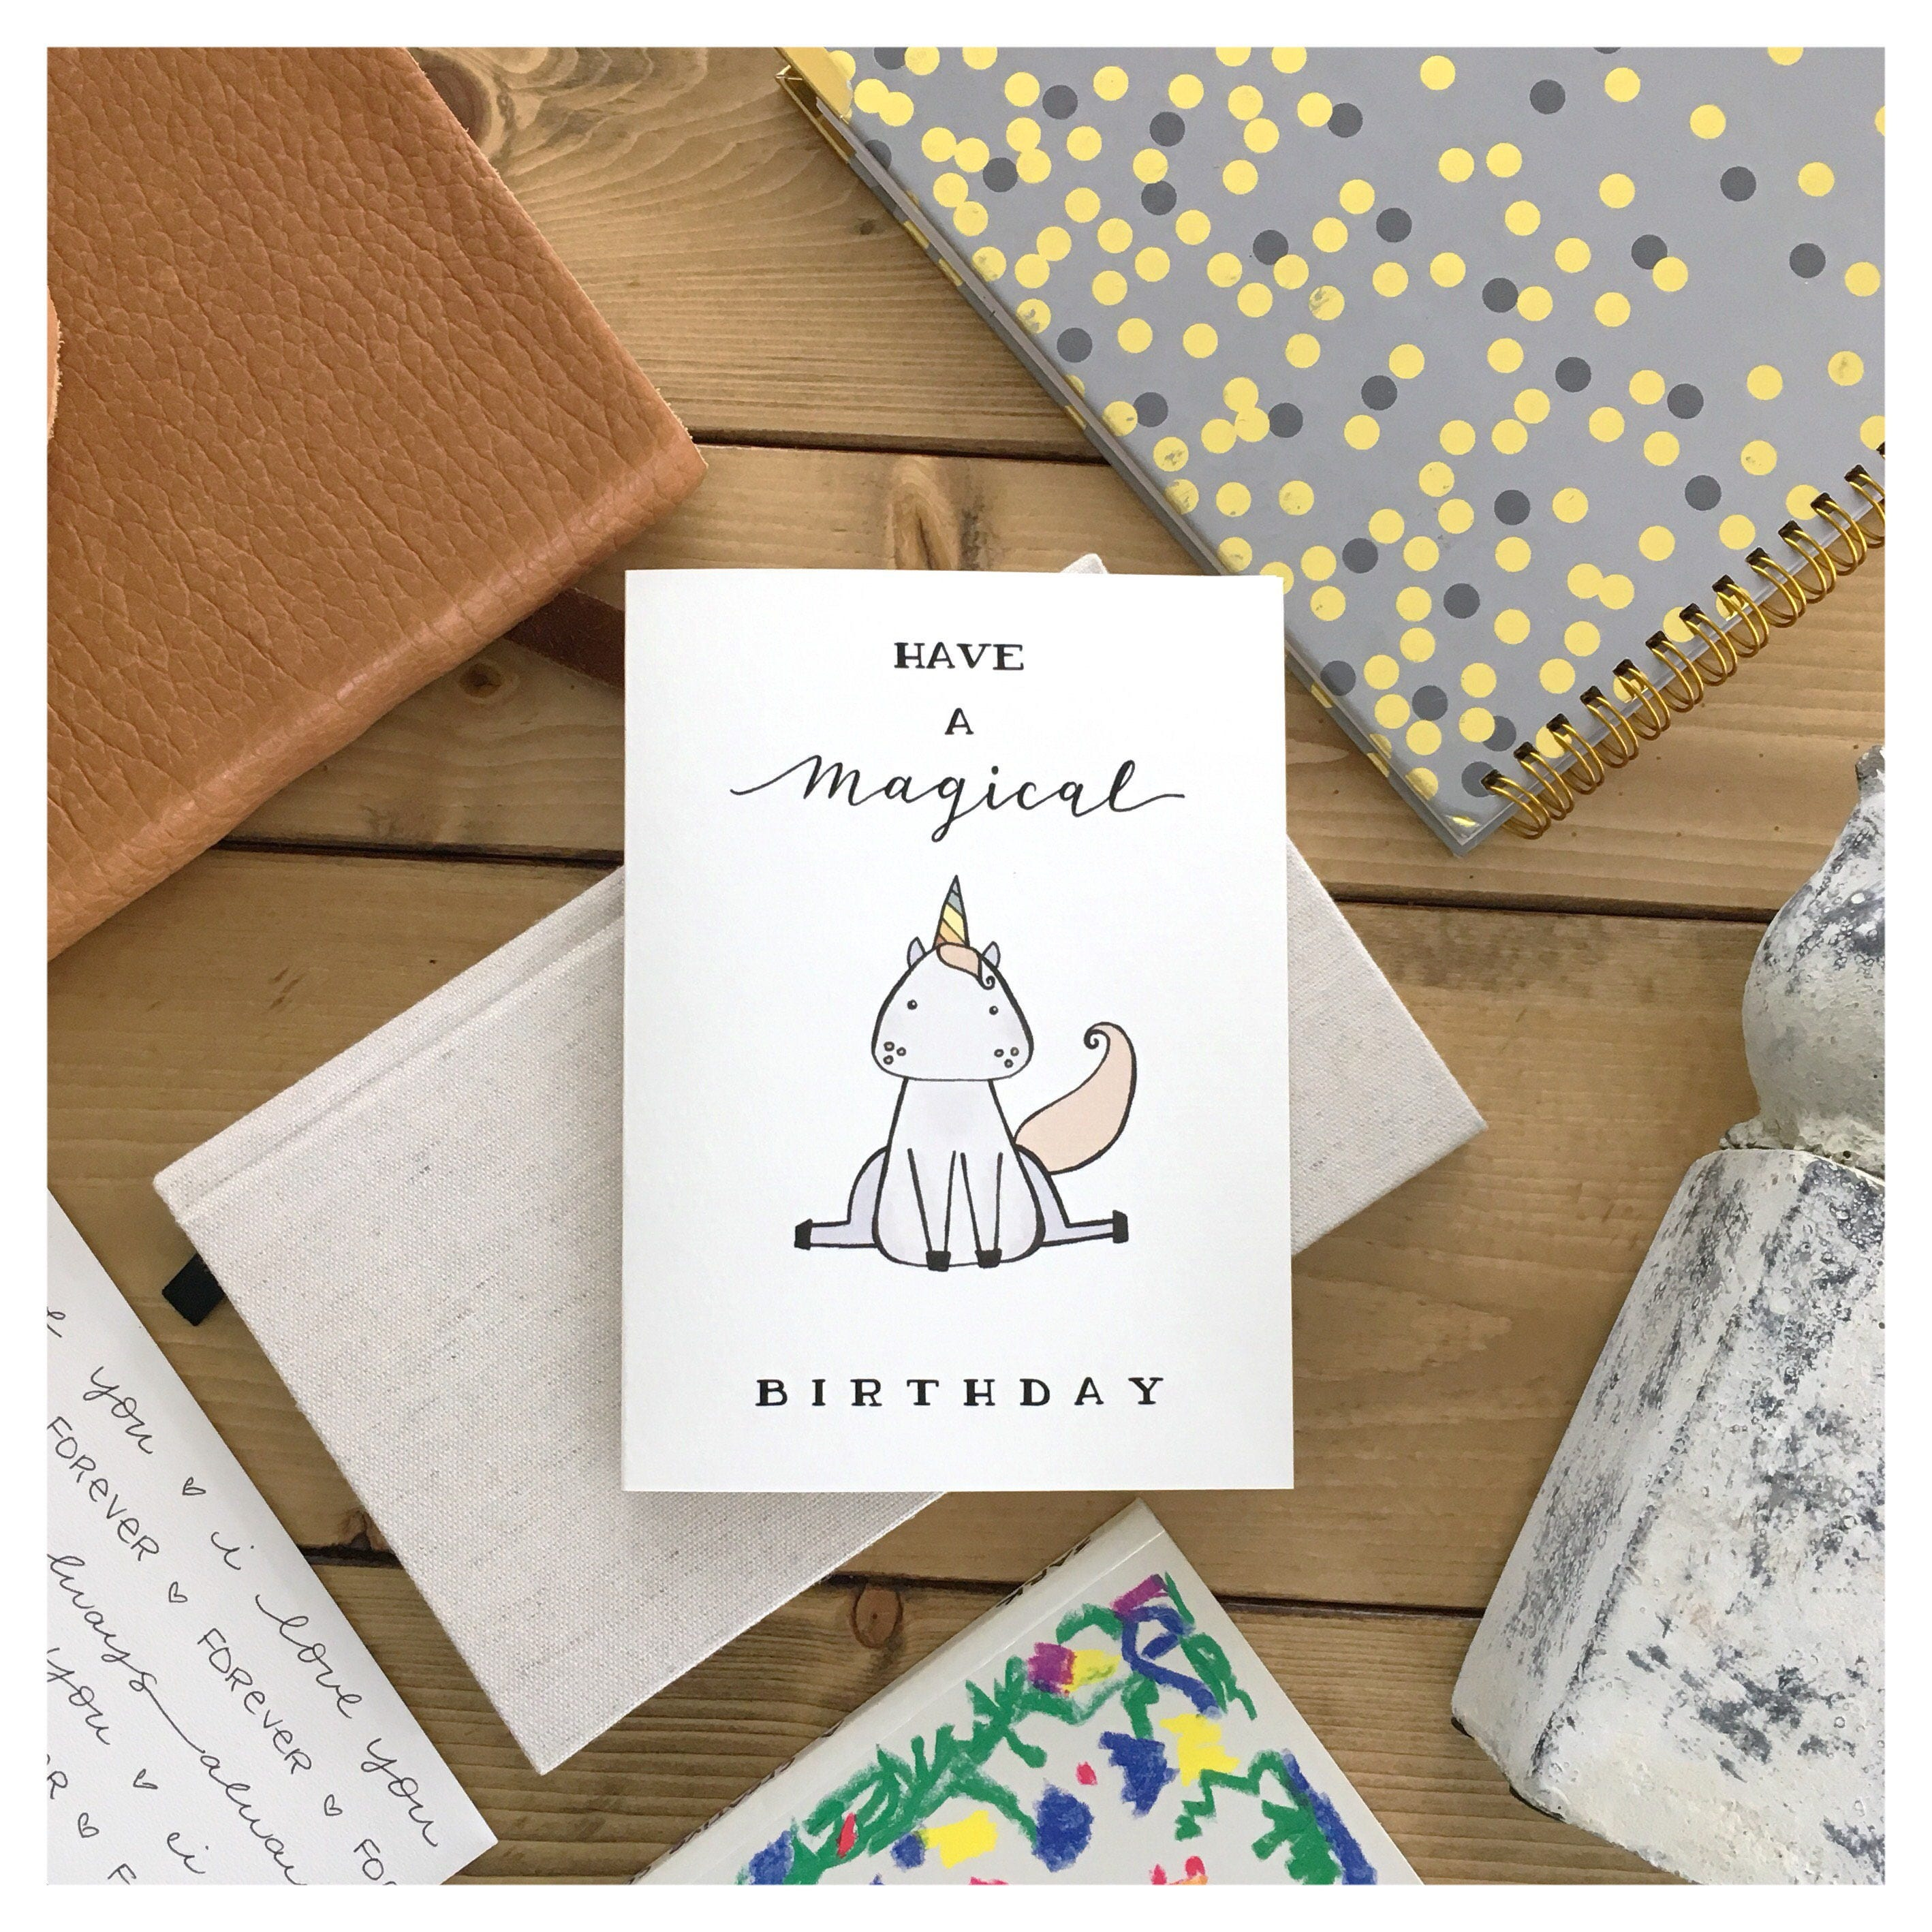 Unicorn unicorn card birthday card magical birthday funny unicorn unicorn card birthday card magical birthday funny birthday card cute card cute birthday card unicorn gift magical card bookmarktalkfo Image collections